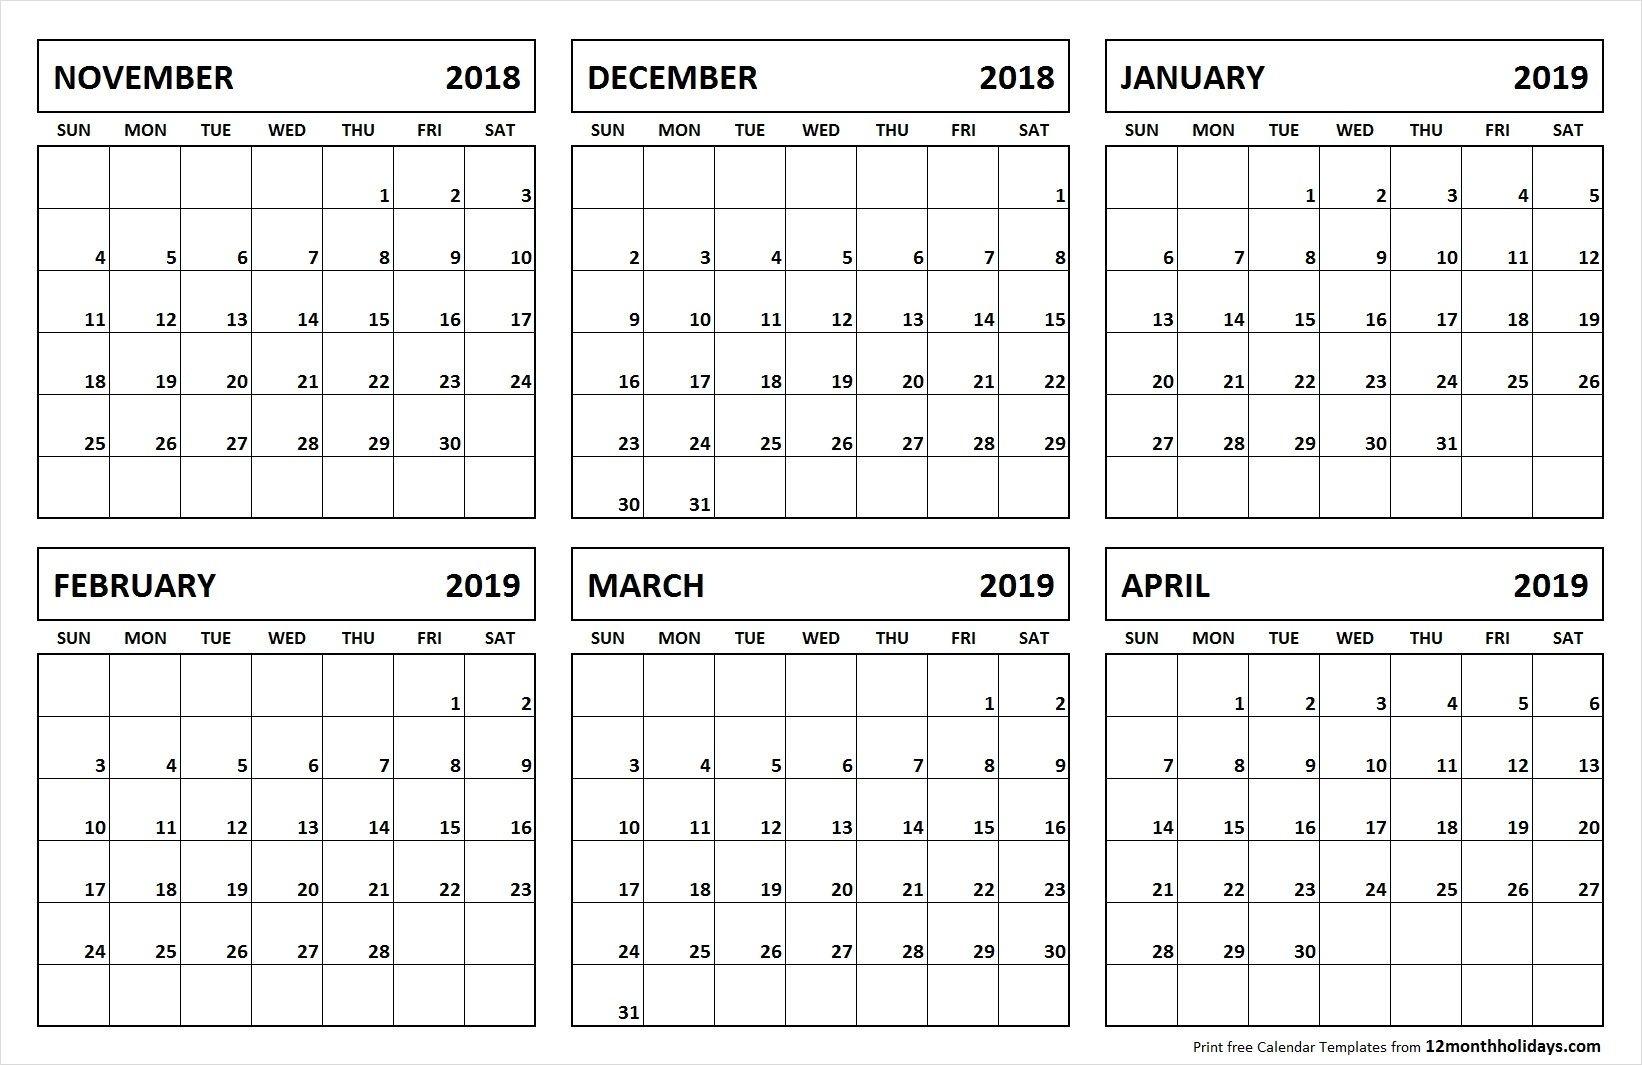 6 Month Calendar November 2018 April 2019 | November 2018 To April 6 Month Calendar Blank